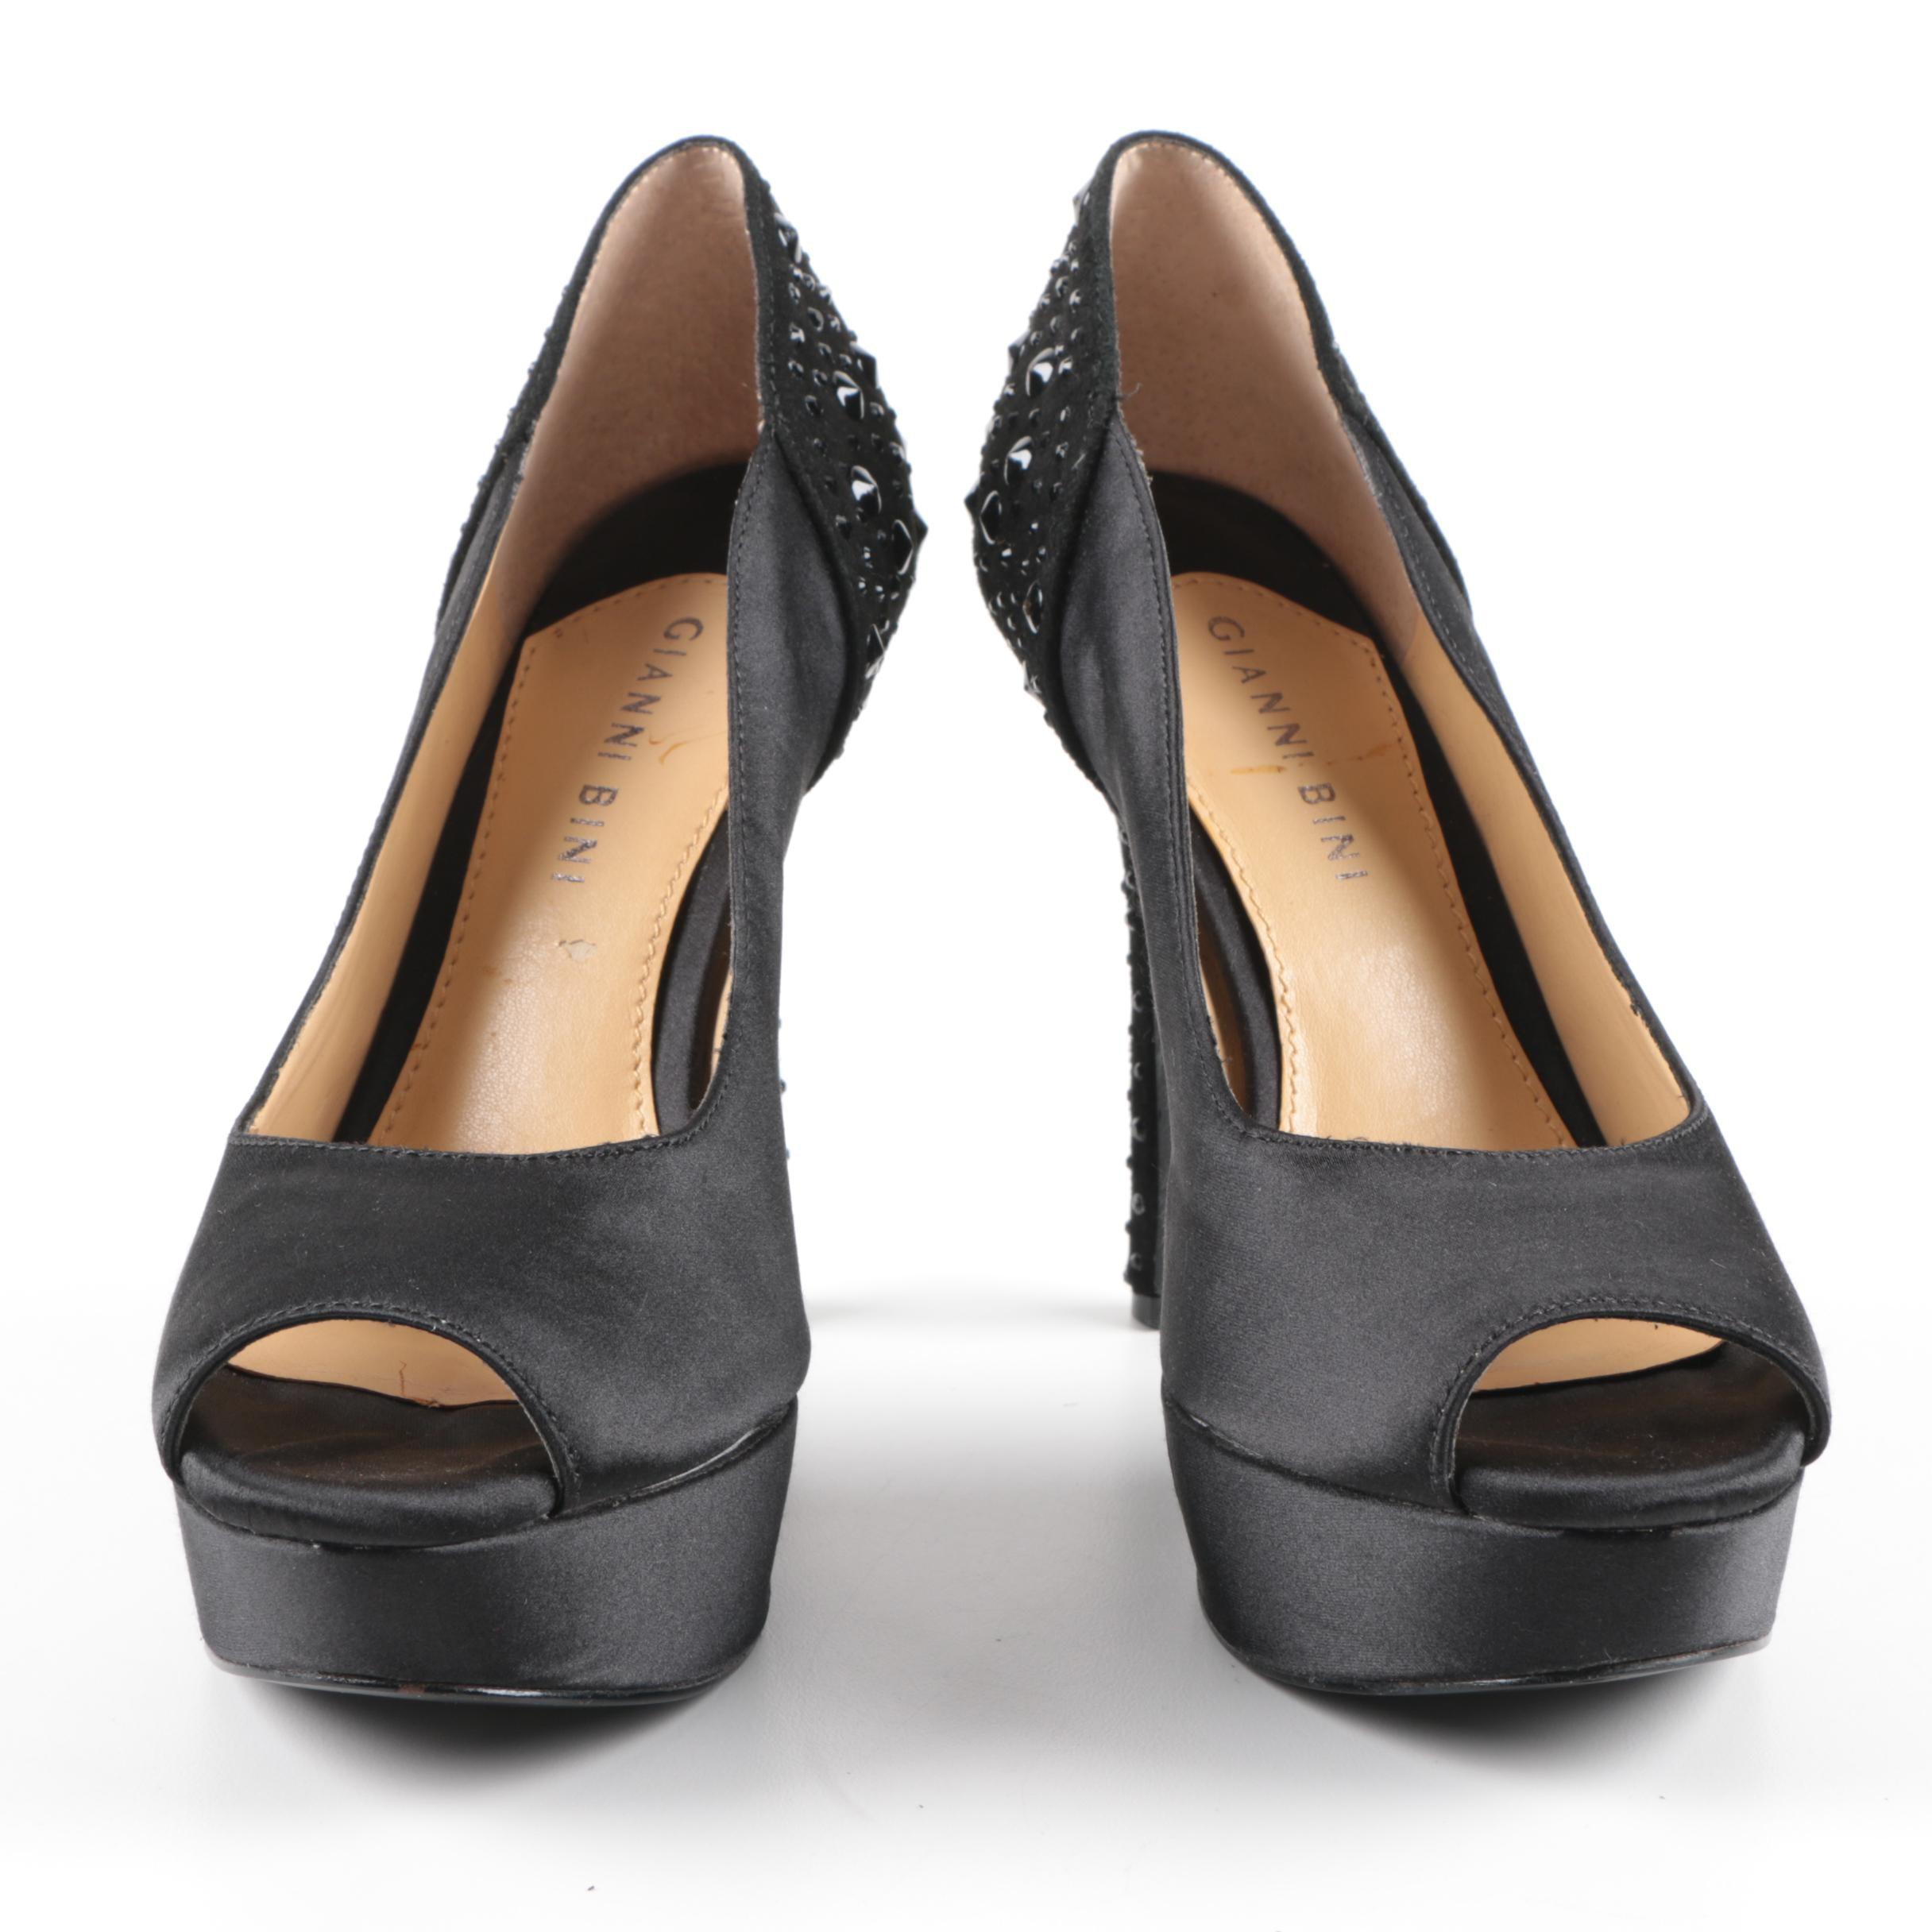 Gianni Bini Black Satin, Suede and Rhinestone Studded Heels